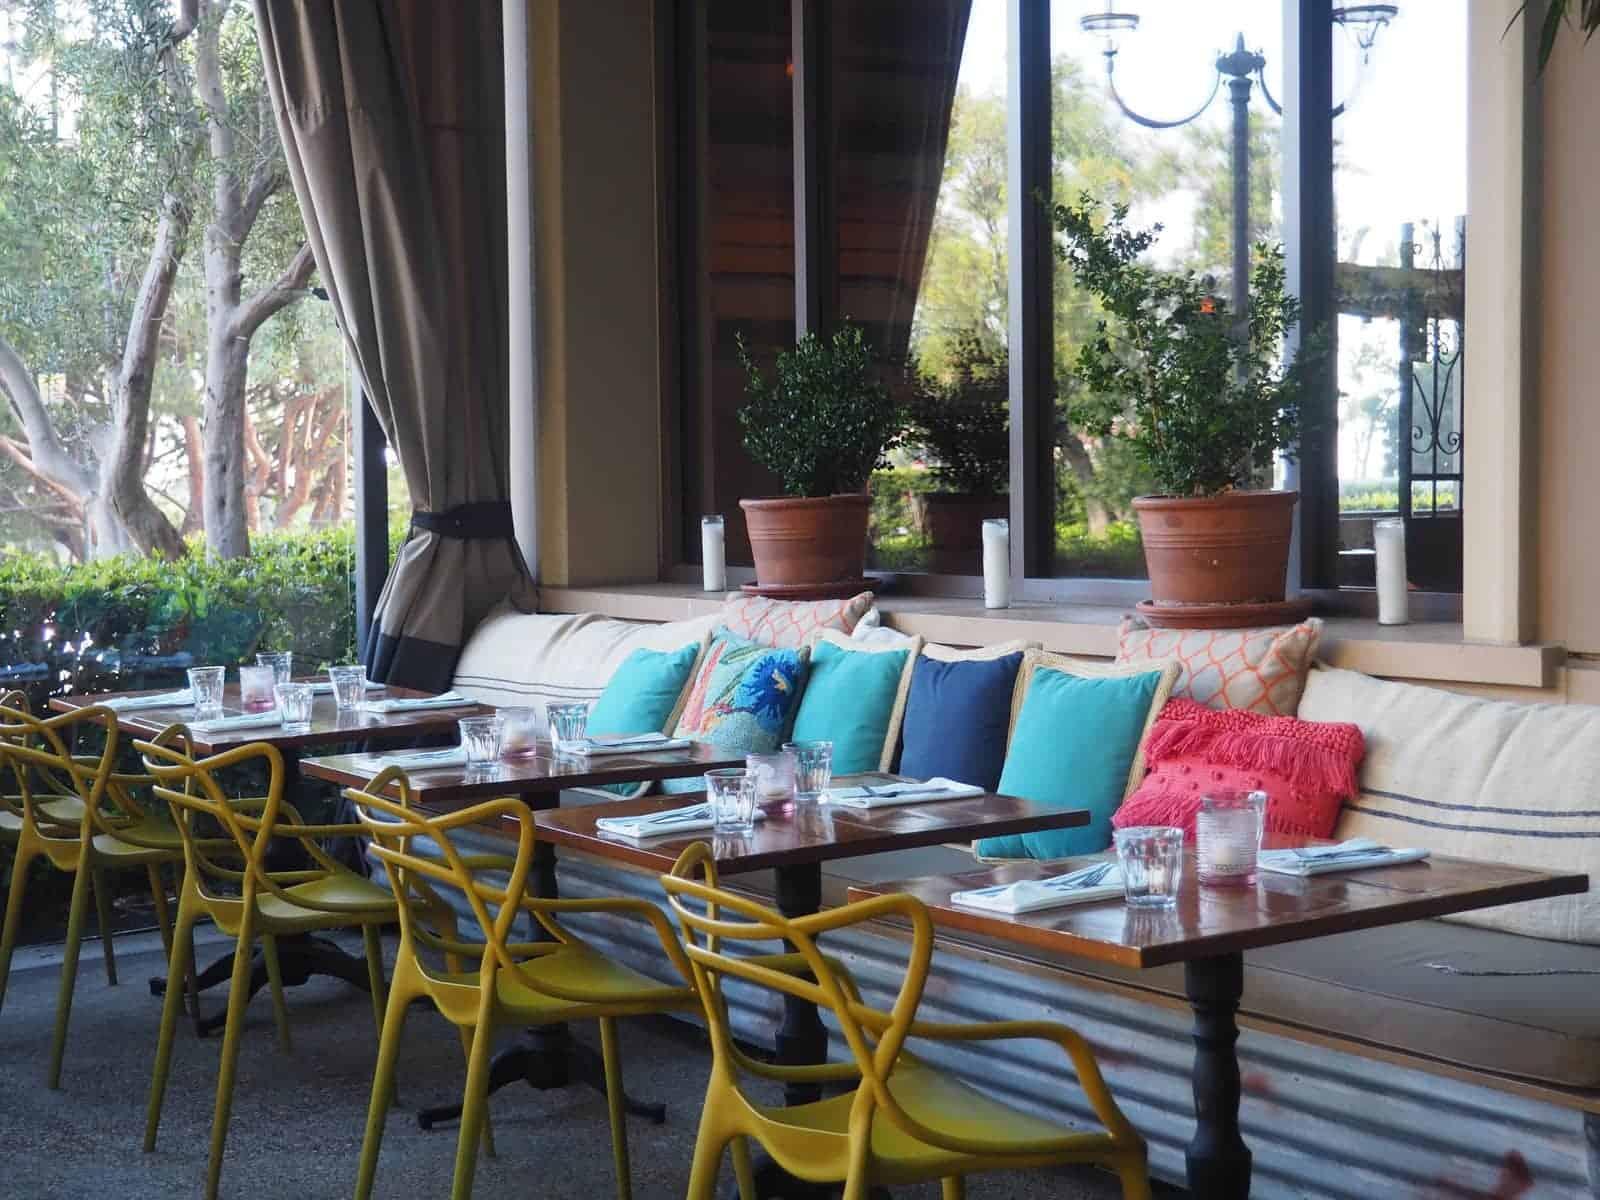 Cucina Enoteca Newport Beach Cucina Enoteca Competitors Revenue